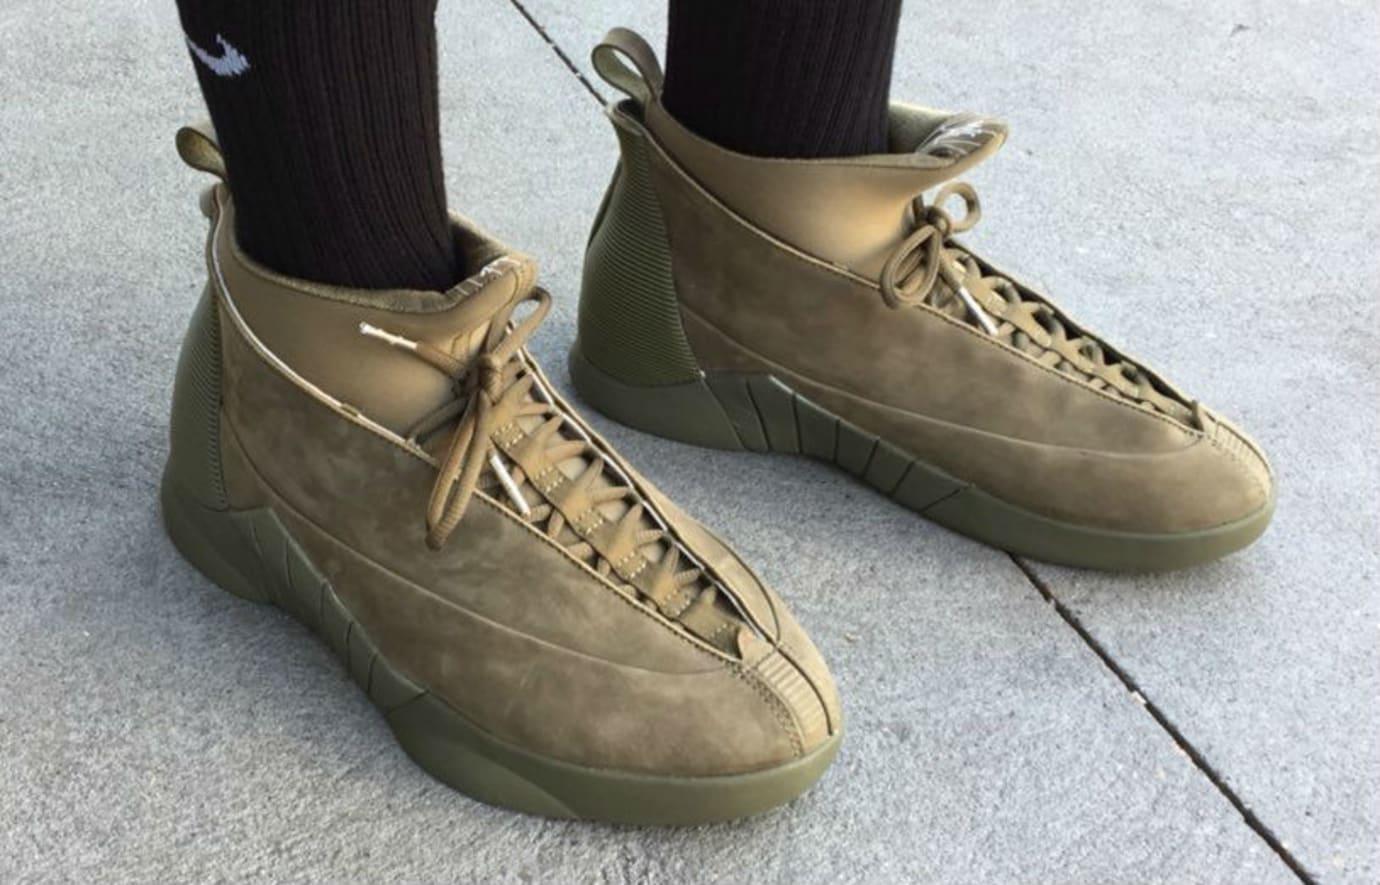 PSNY x Air Jordan 15 Olive Suede